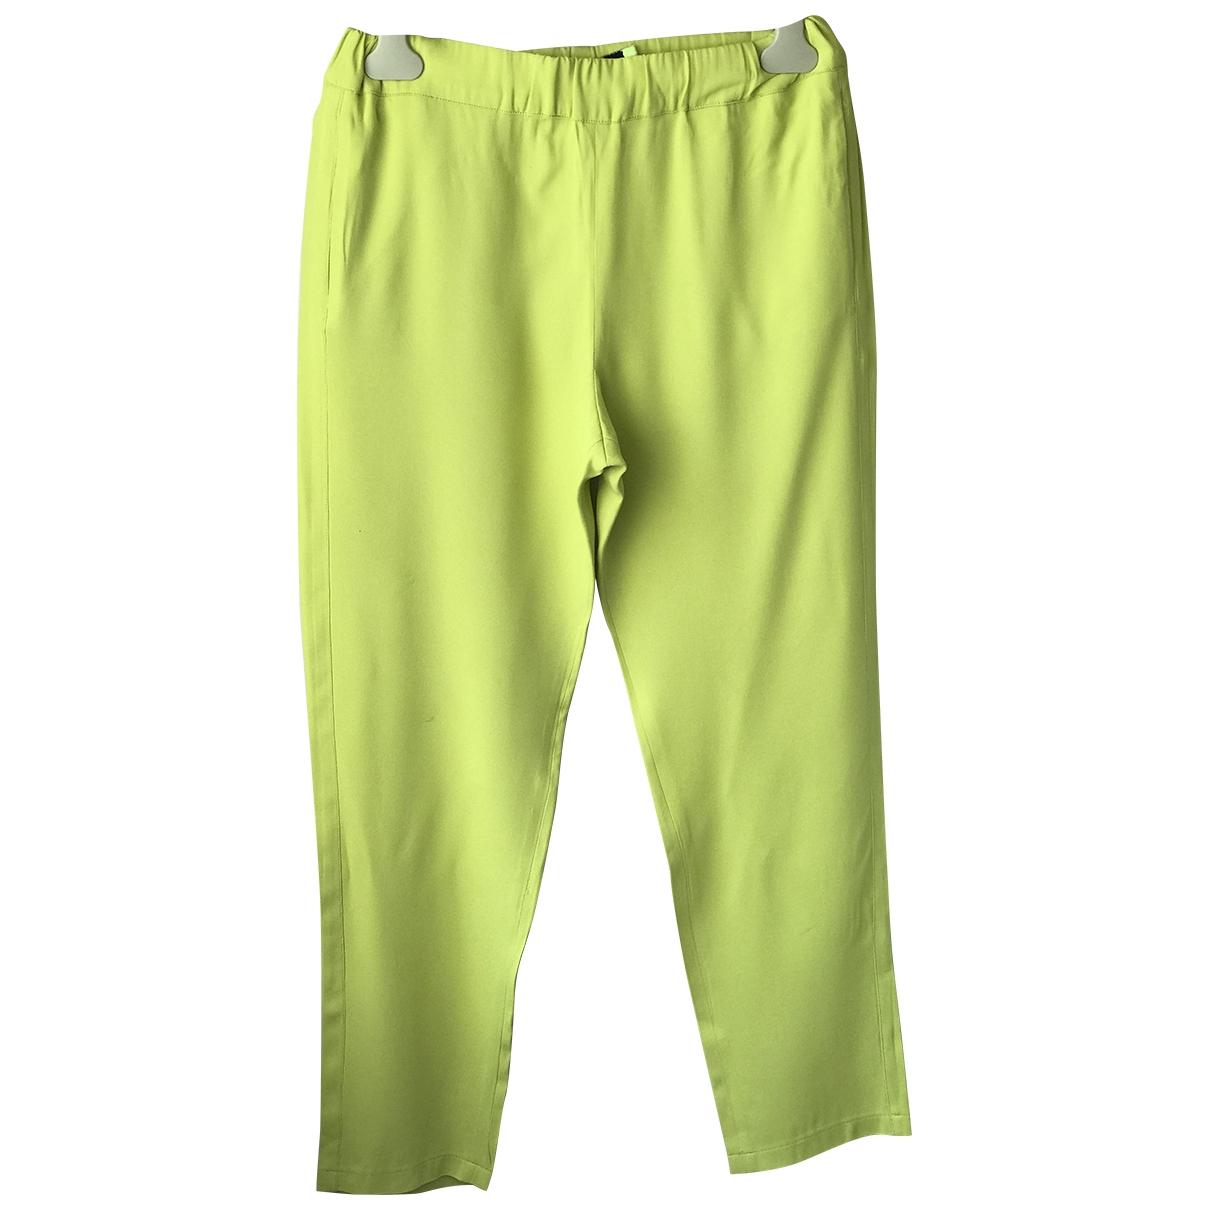 Msgm - Pantalon   pour femme - jaune